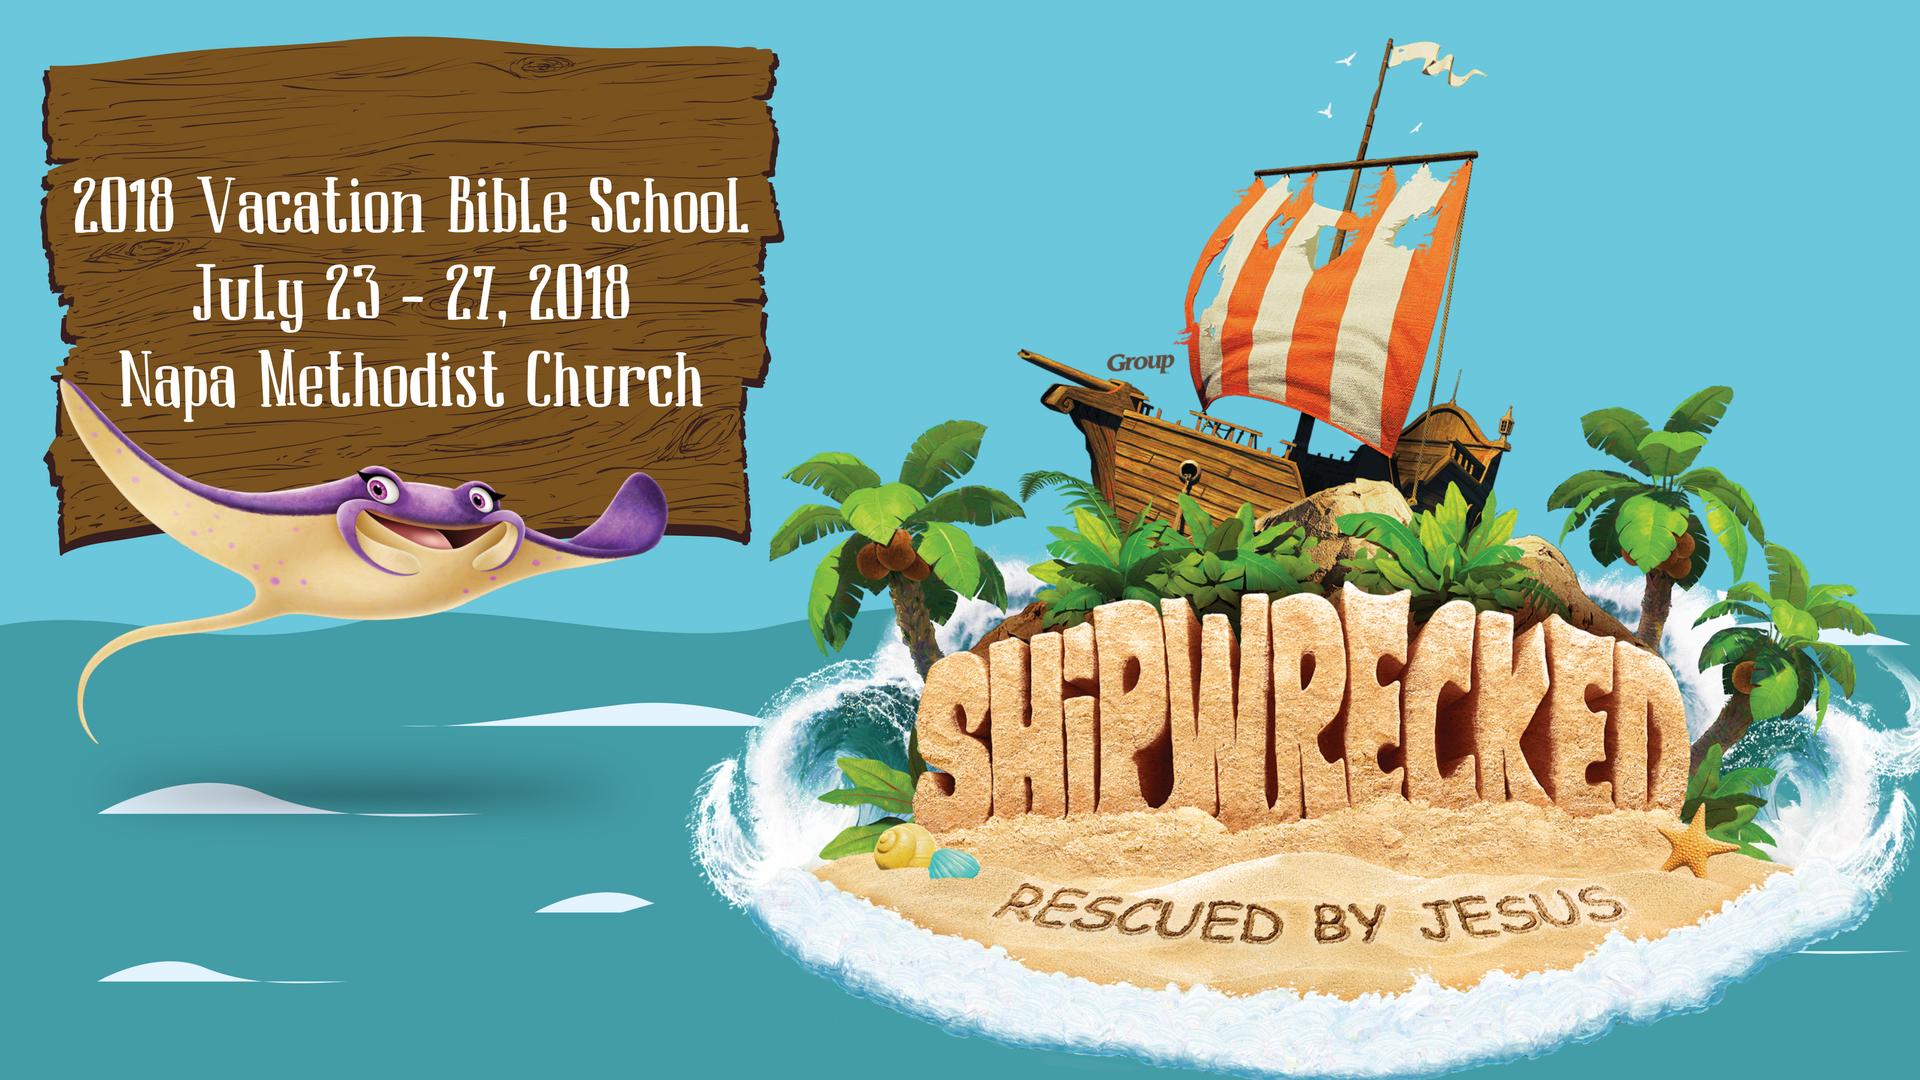 Napa Methodist Church VBS 2018: Shipwrecked